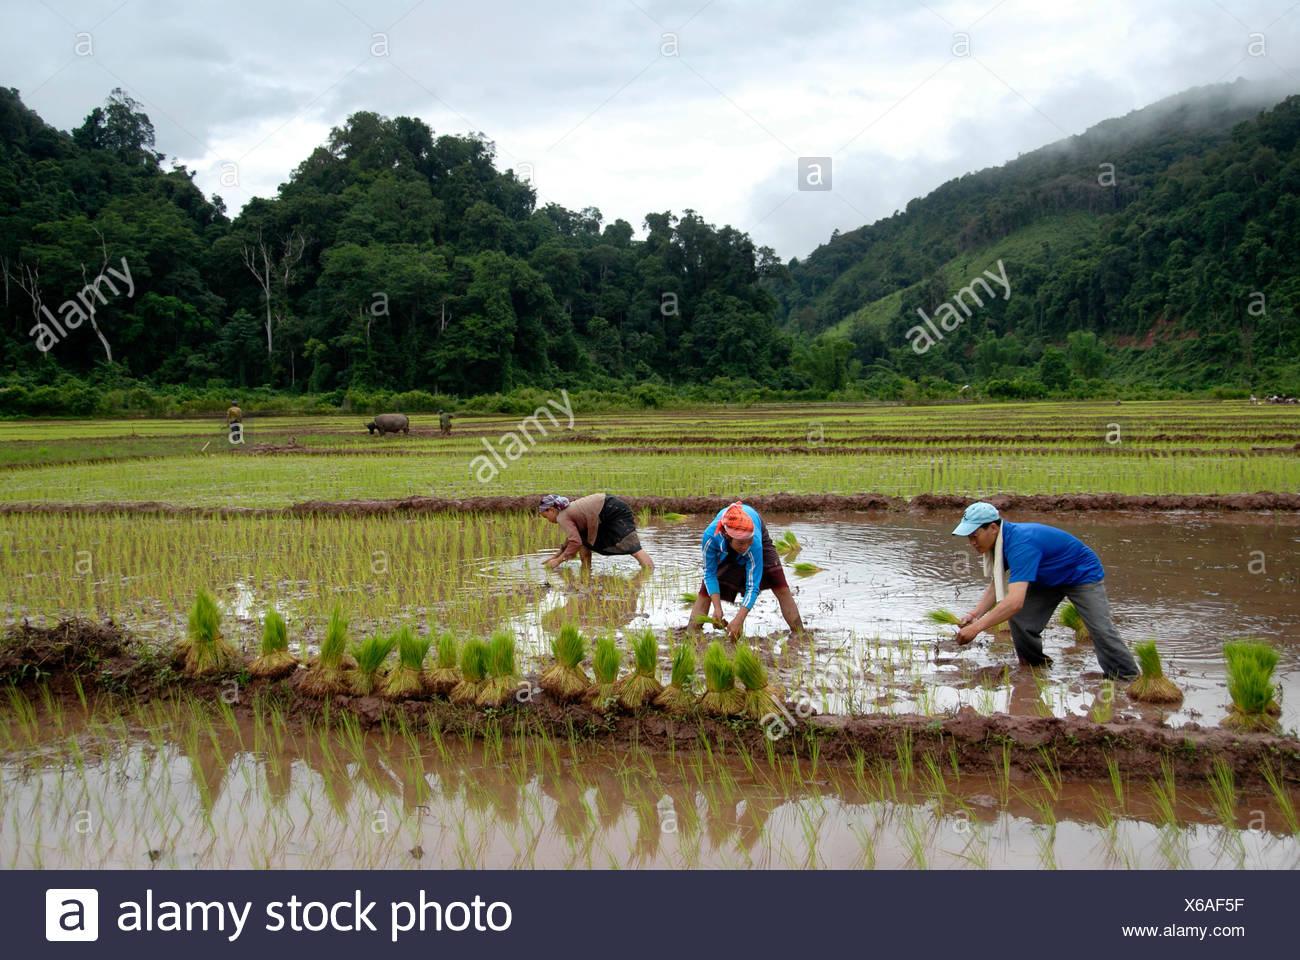 Men and women planting rice near Ban Naten, Nam Lan Conservation Area, Phongsali Province, Laos, South East Asia - Stock Image